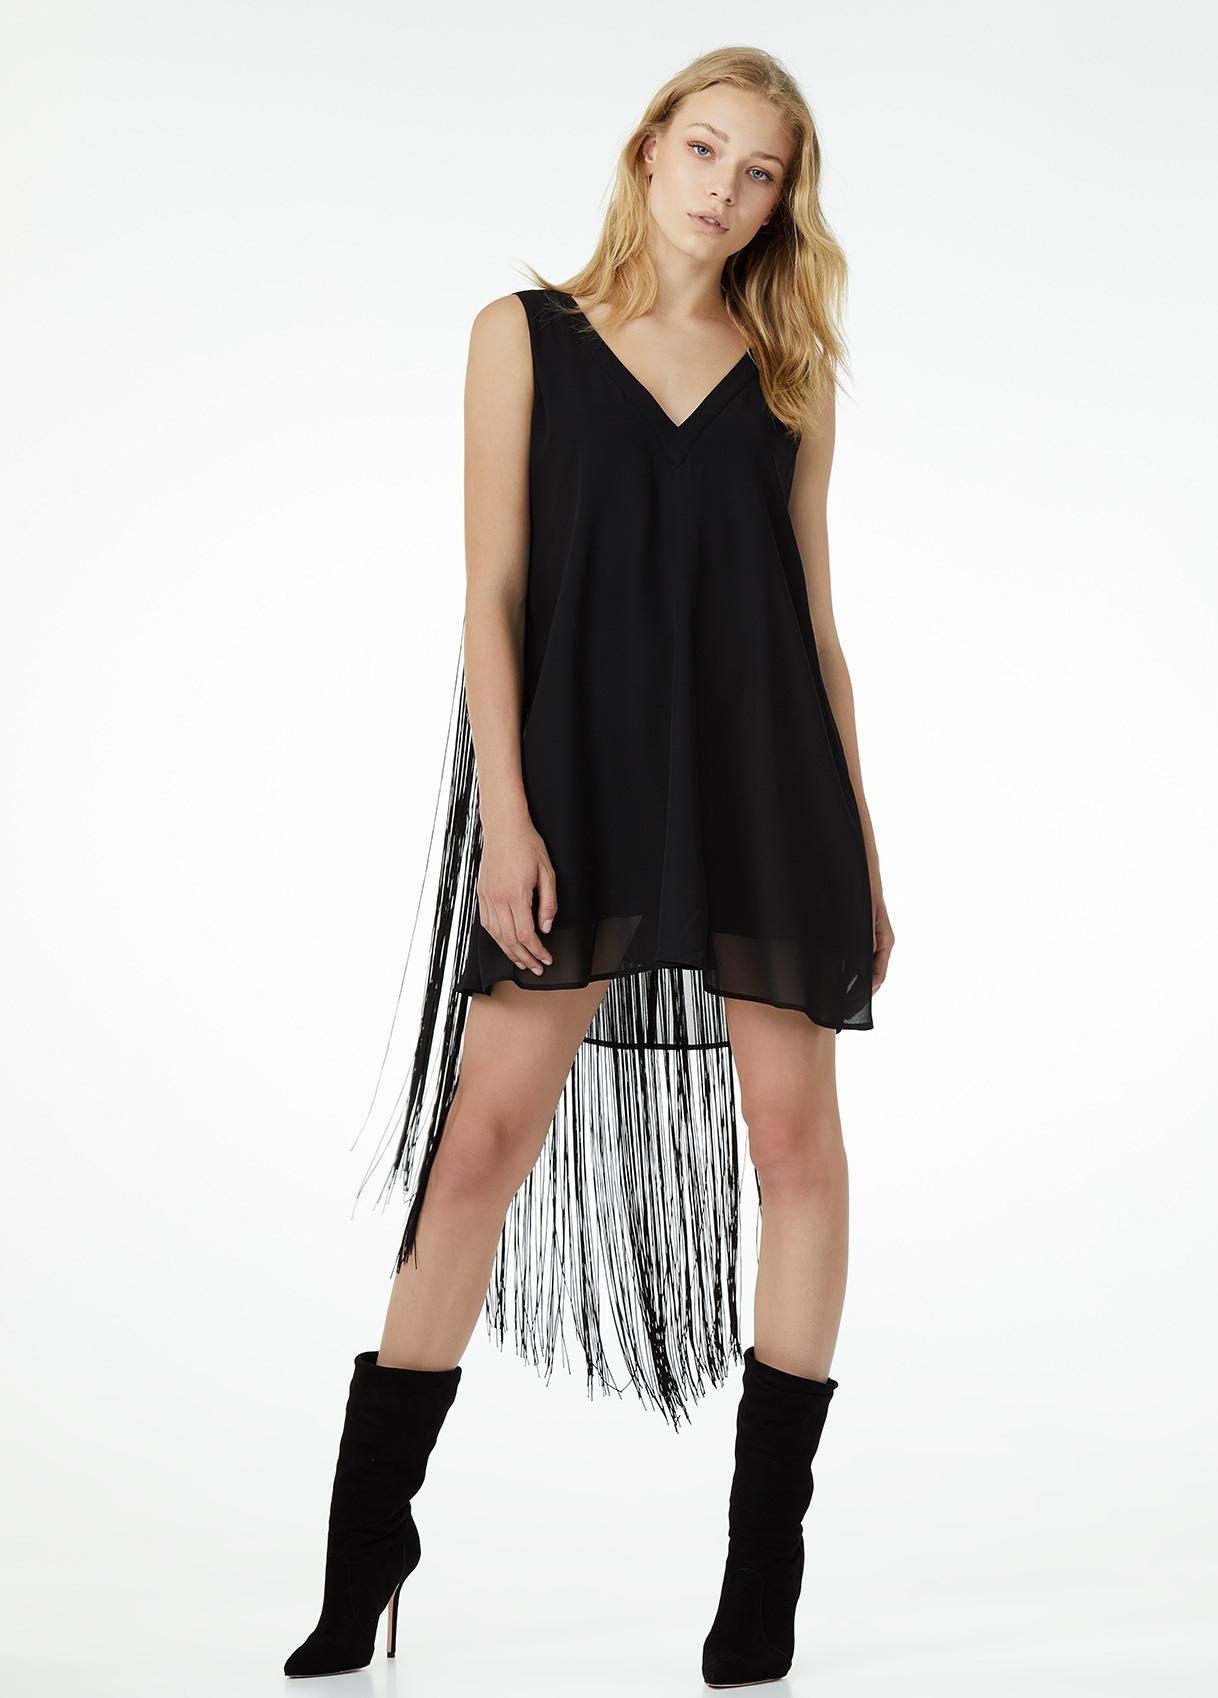 Designer Elegant Kurzes Kleid Bester Preis10 Cool Kurzes Kleid Galerie